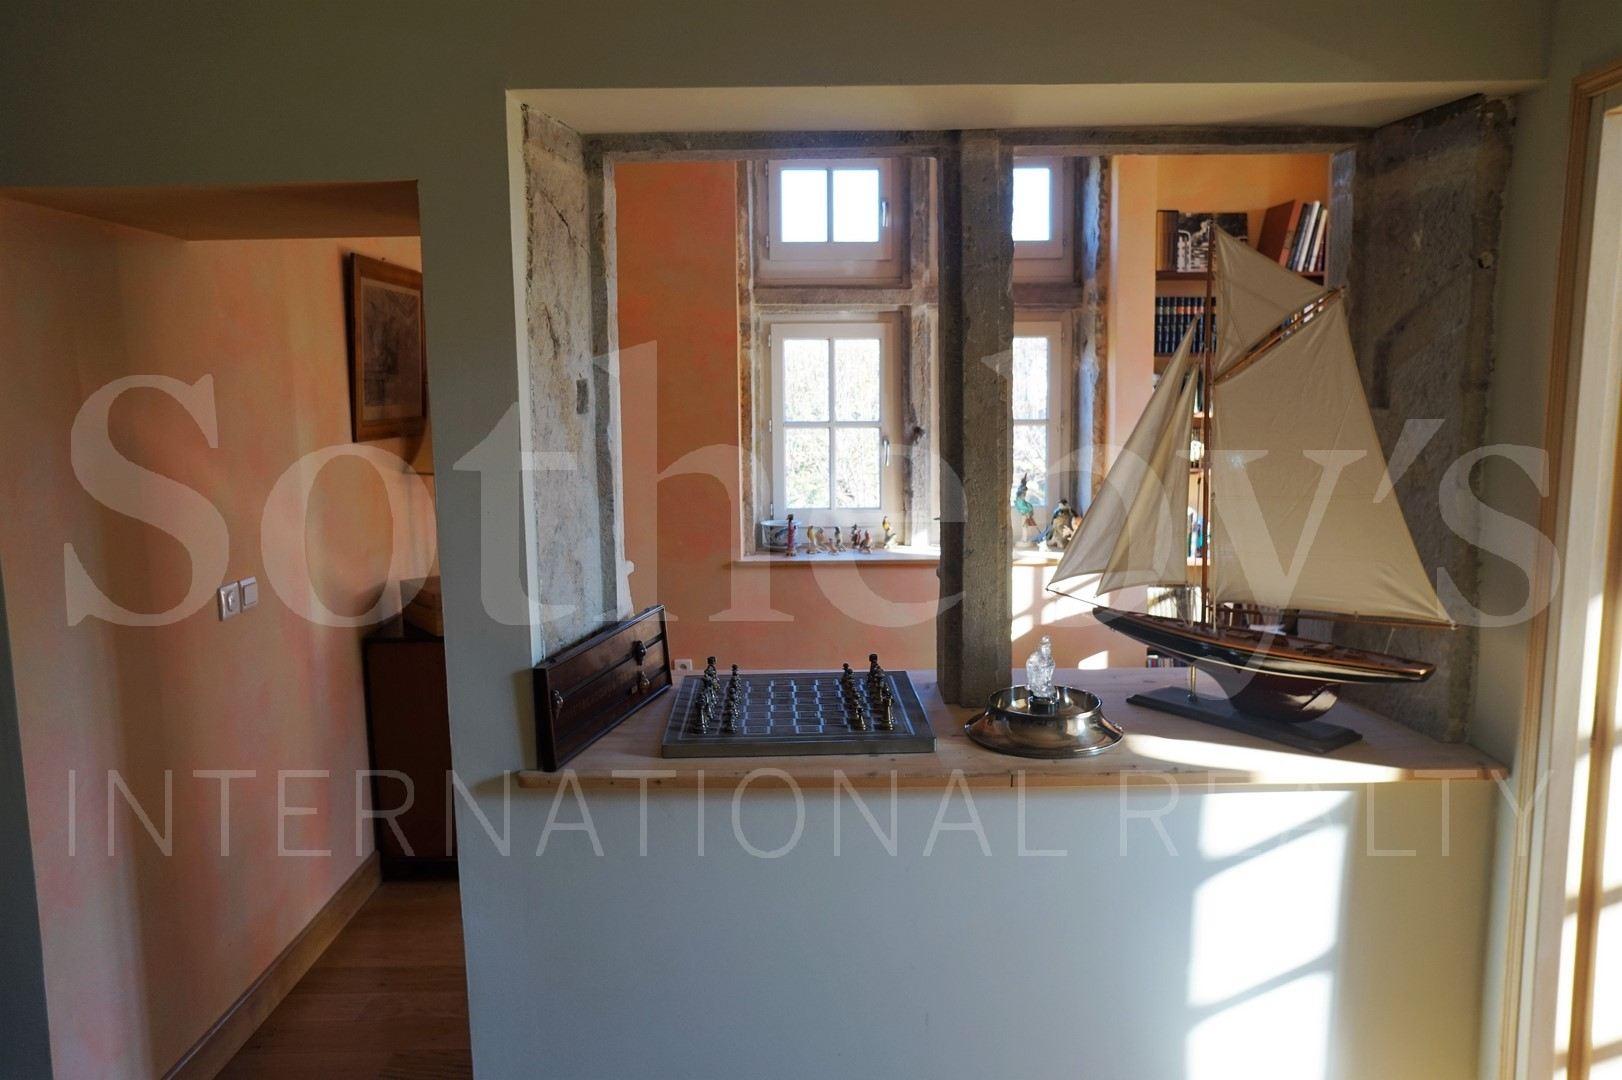 Apartamento por un Venta en ST-CYR-AU-MONT-D'OR Other Rhone-Alpes, Ródano-Alpes, 69450 Francia